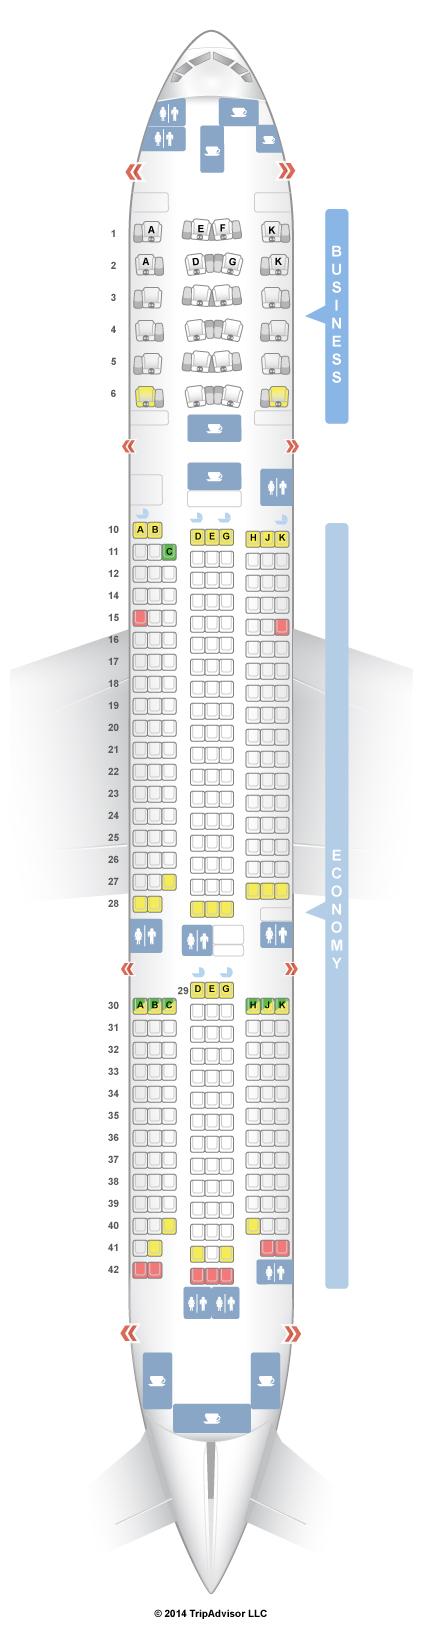 SeatGuru Seat Map Asiana Boeing 777-200ER (772) V1